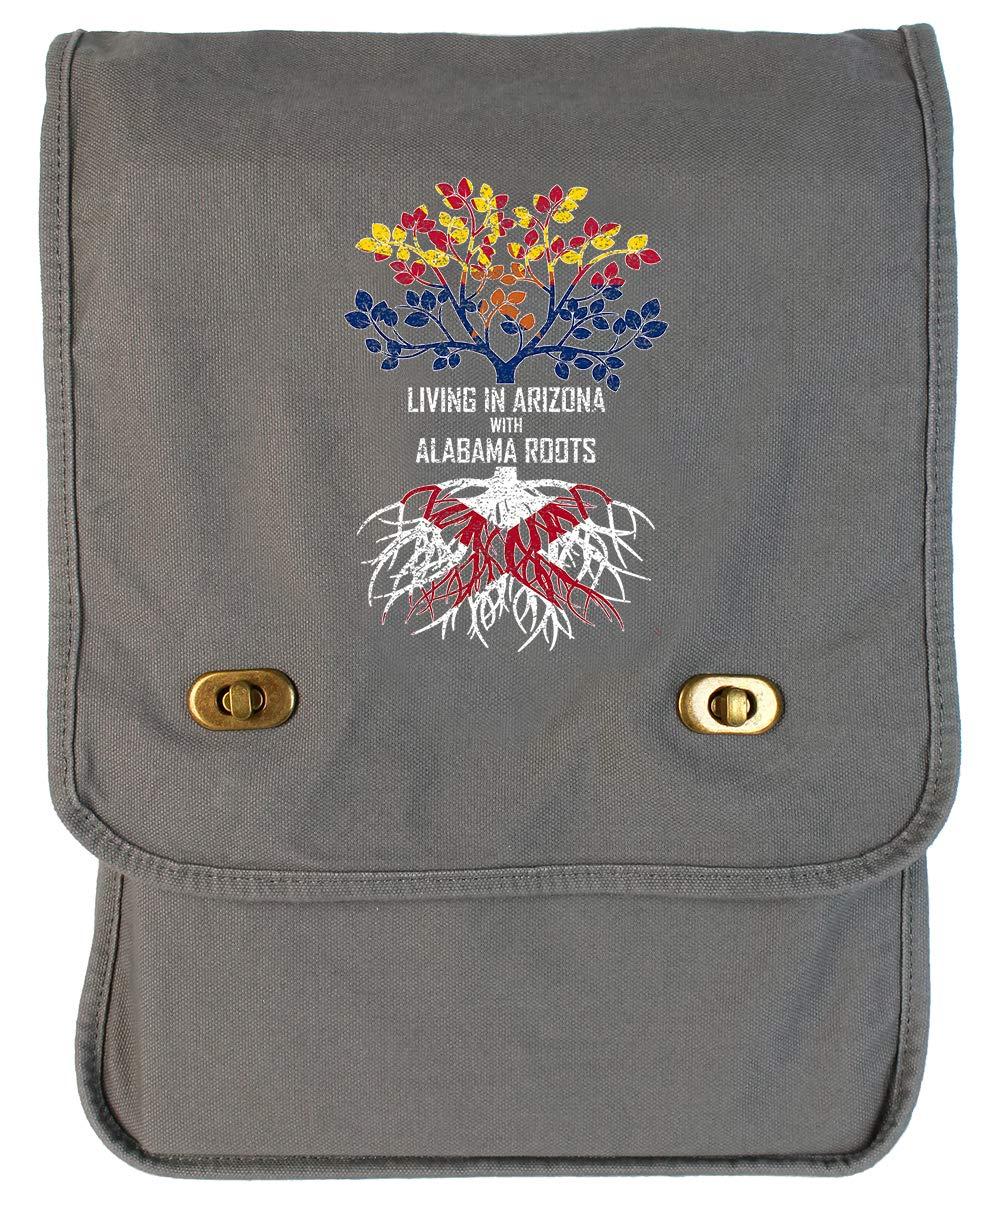 Tenacitee Living In Arizona with Alabama Roots Grey Brushed Canvas Messenger Bag